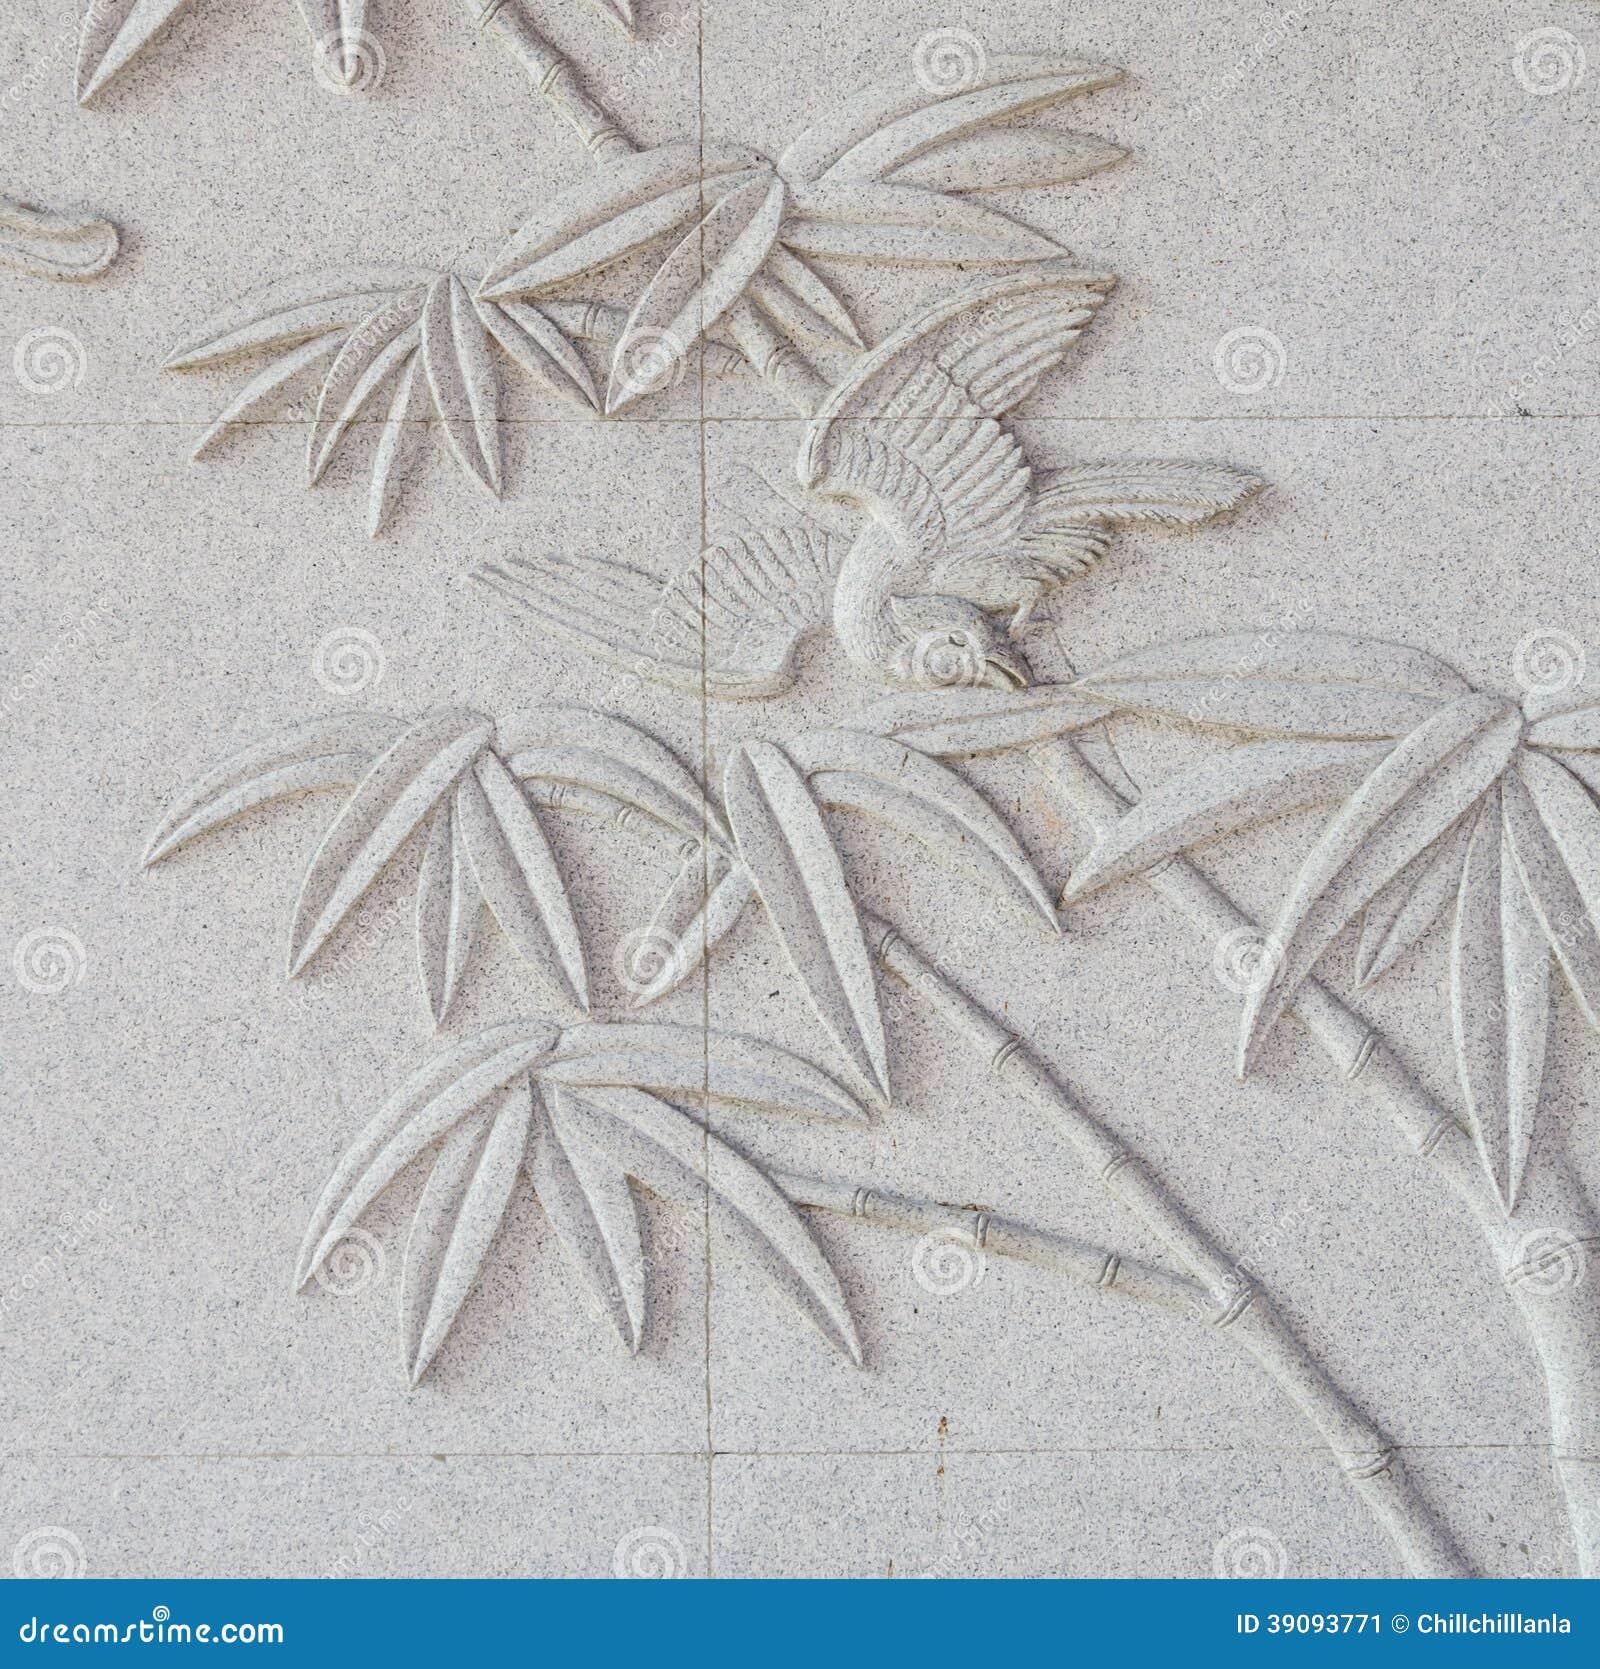 Stone Wall Art asian style stone wall art royalty free stock photo - image: 4537525